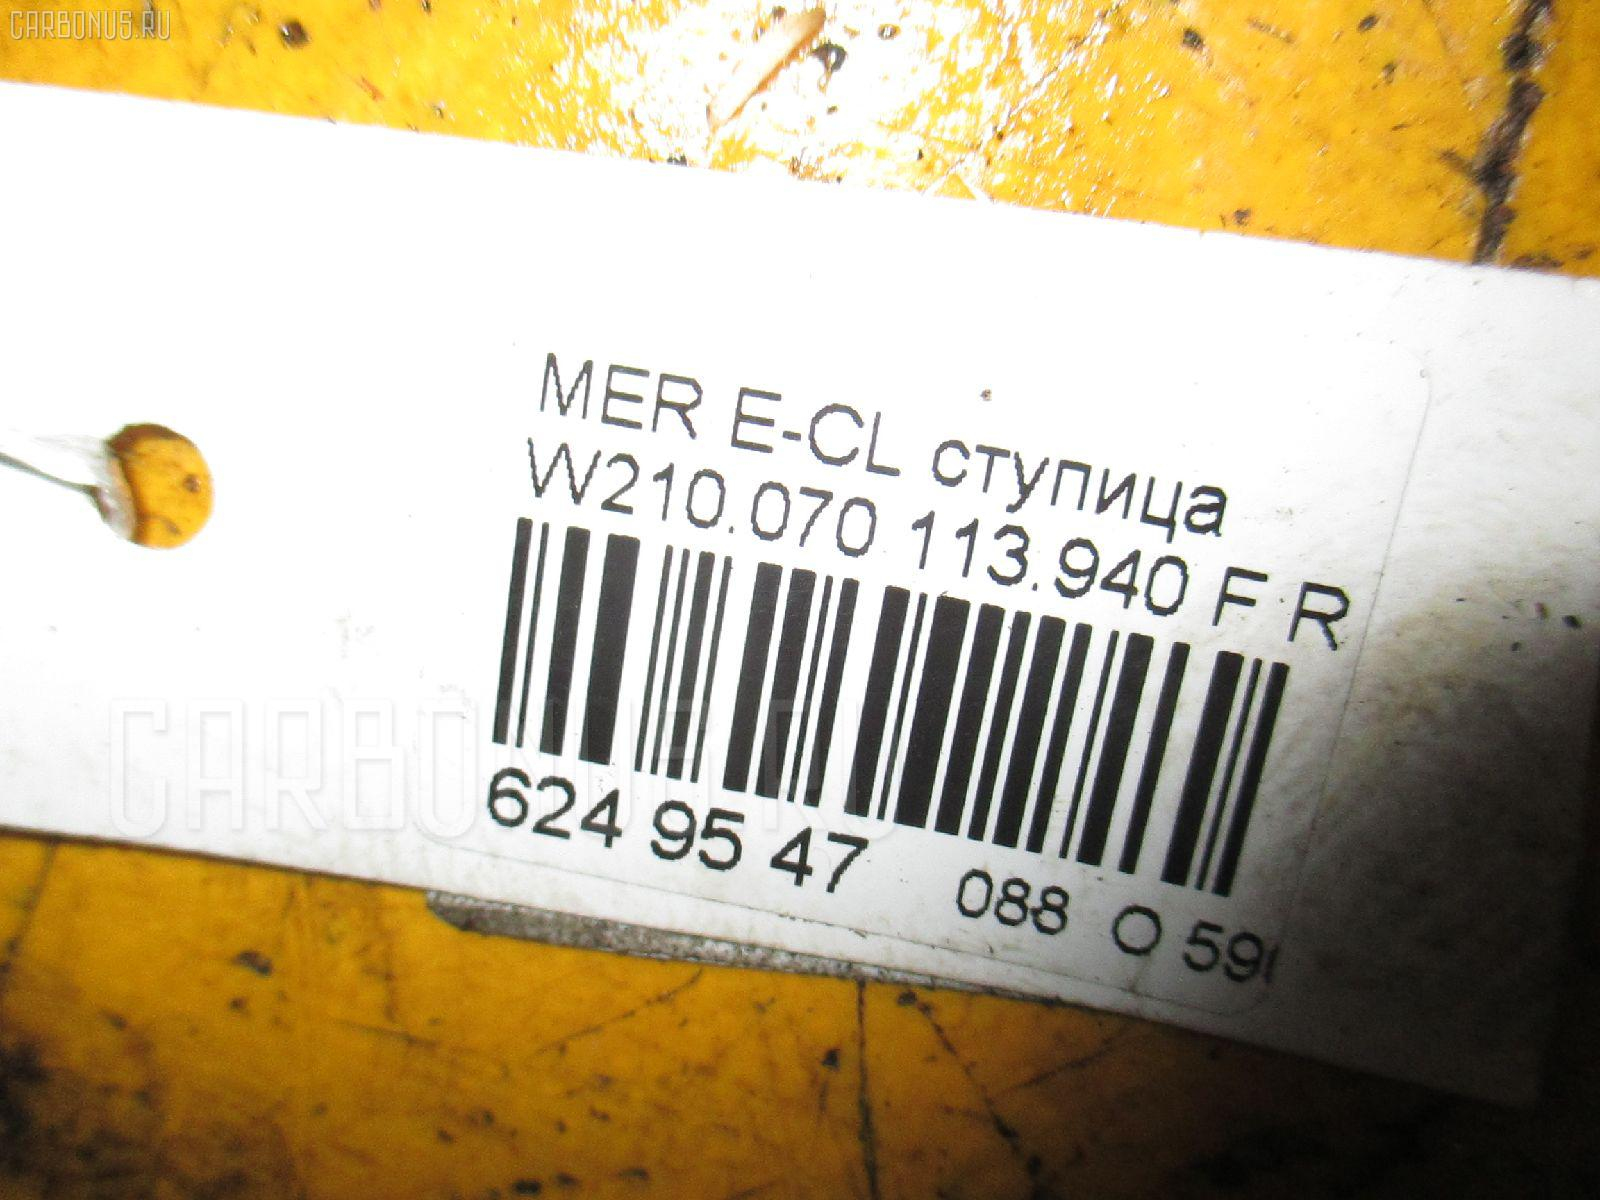 Ступица MERCEDES-BENZ E-CLASS W210.070 113.940 Фото 3